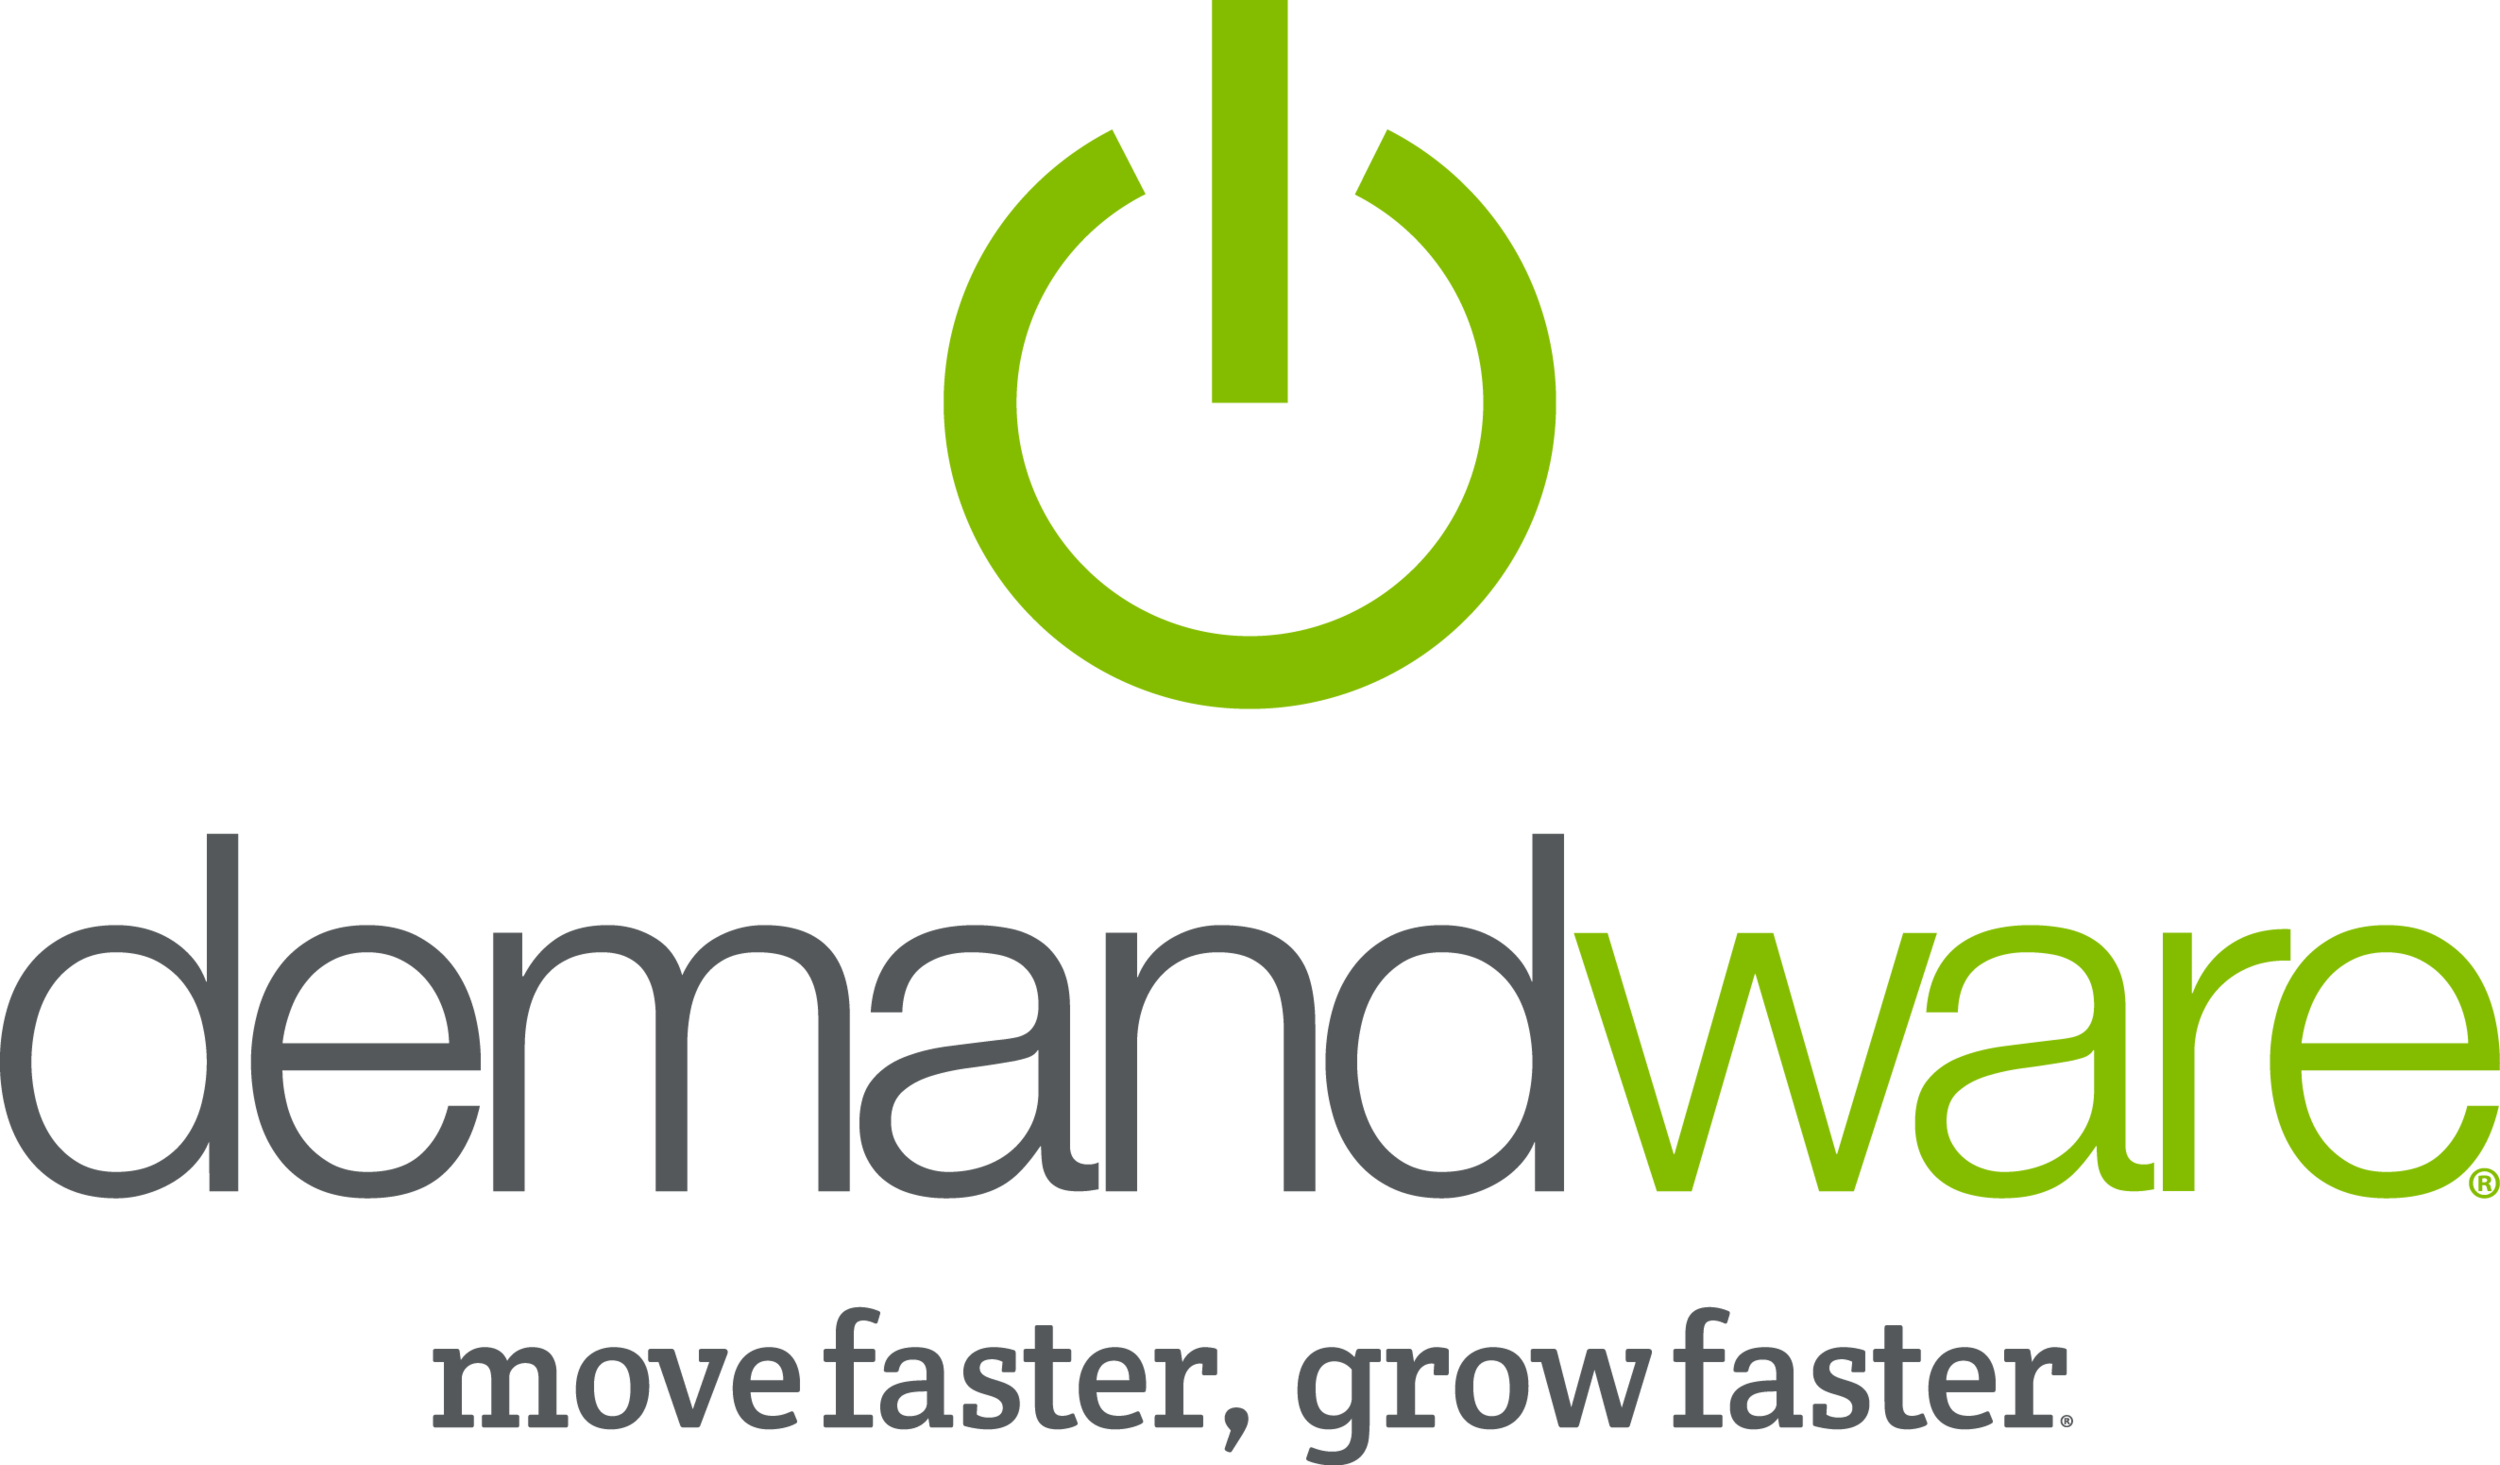 Working with Demandware